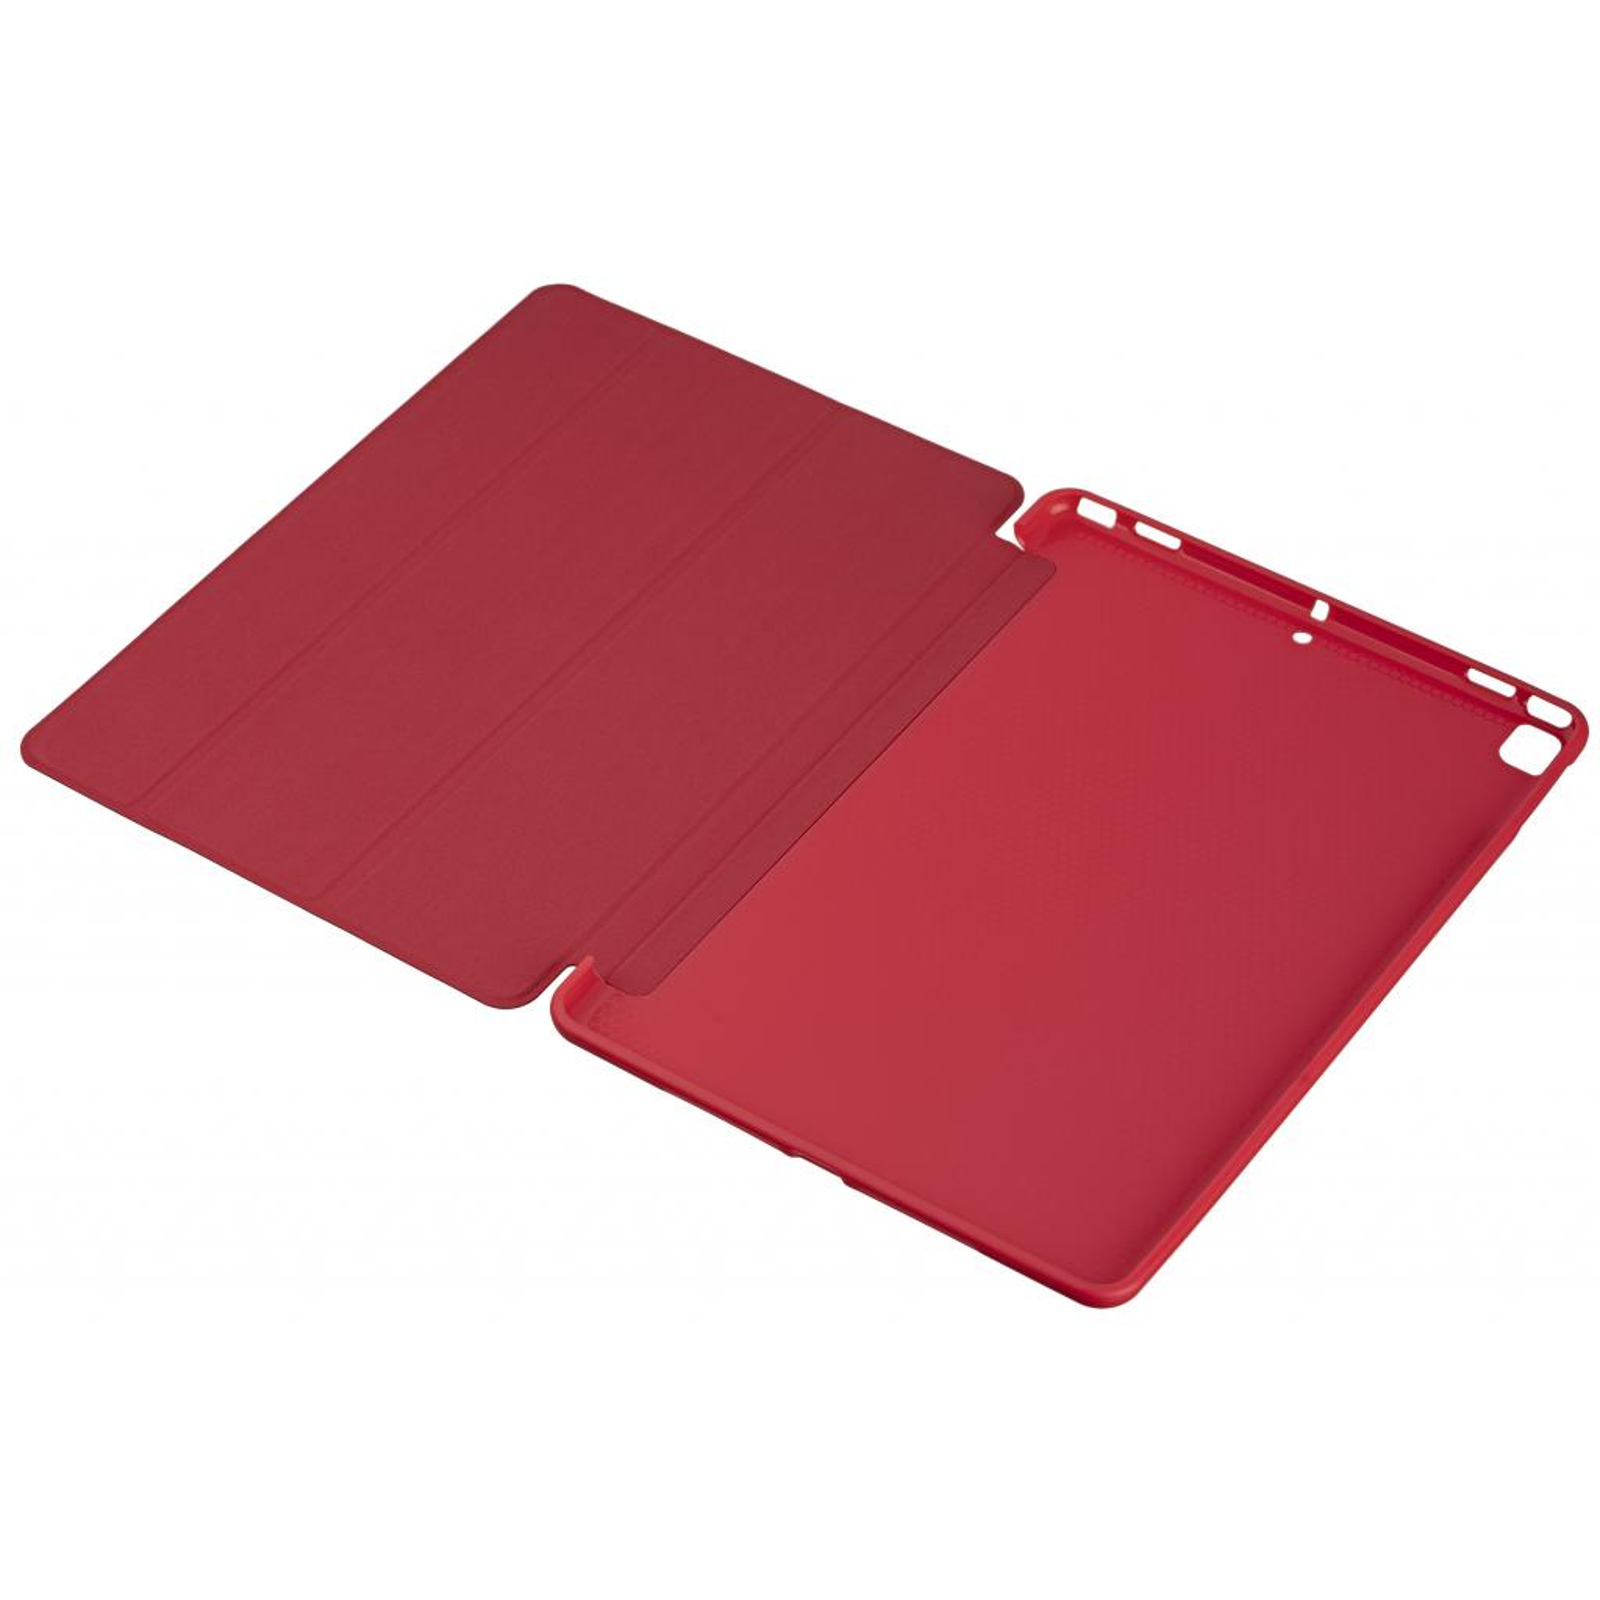 Чохол до планшета 2E Basic Apple iPad 10.2` 2019, Flex, Red (2E-IPAD-10.2-19-IKFX-RD) зображення 2